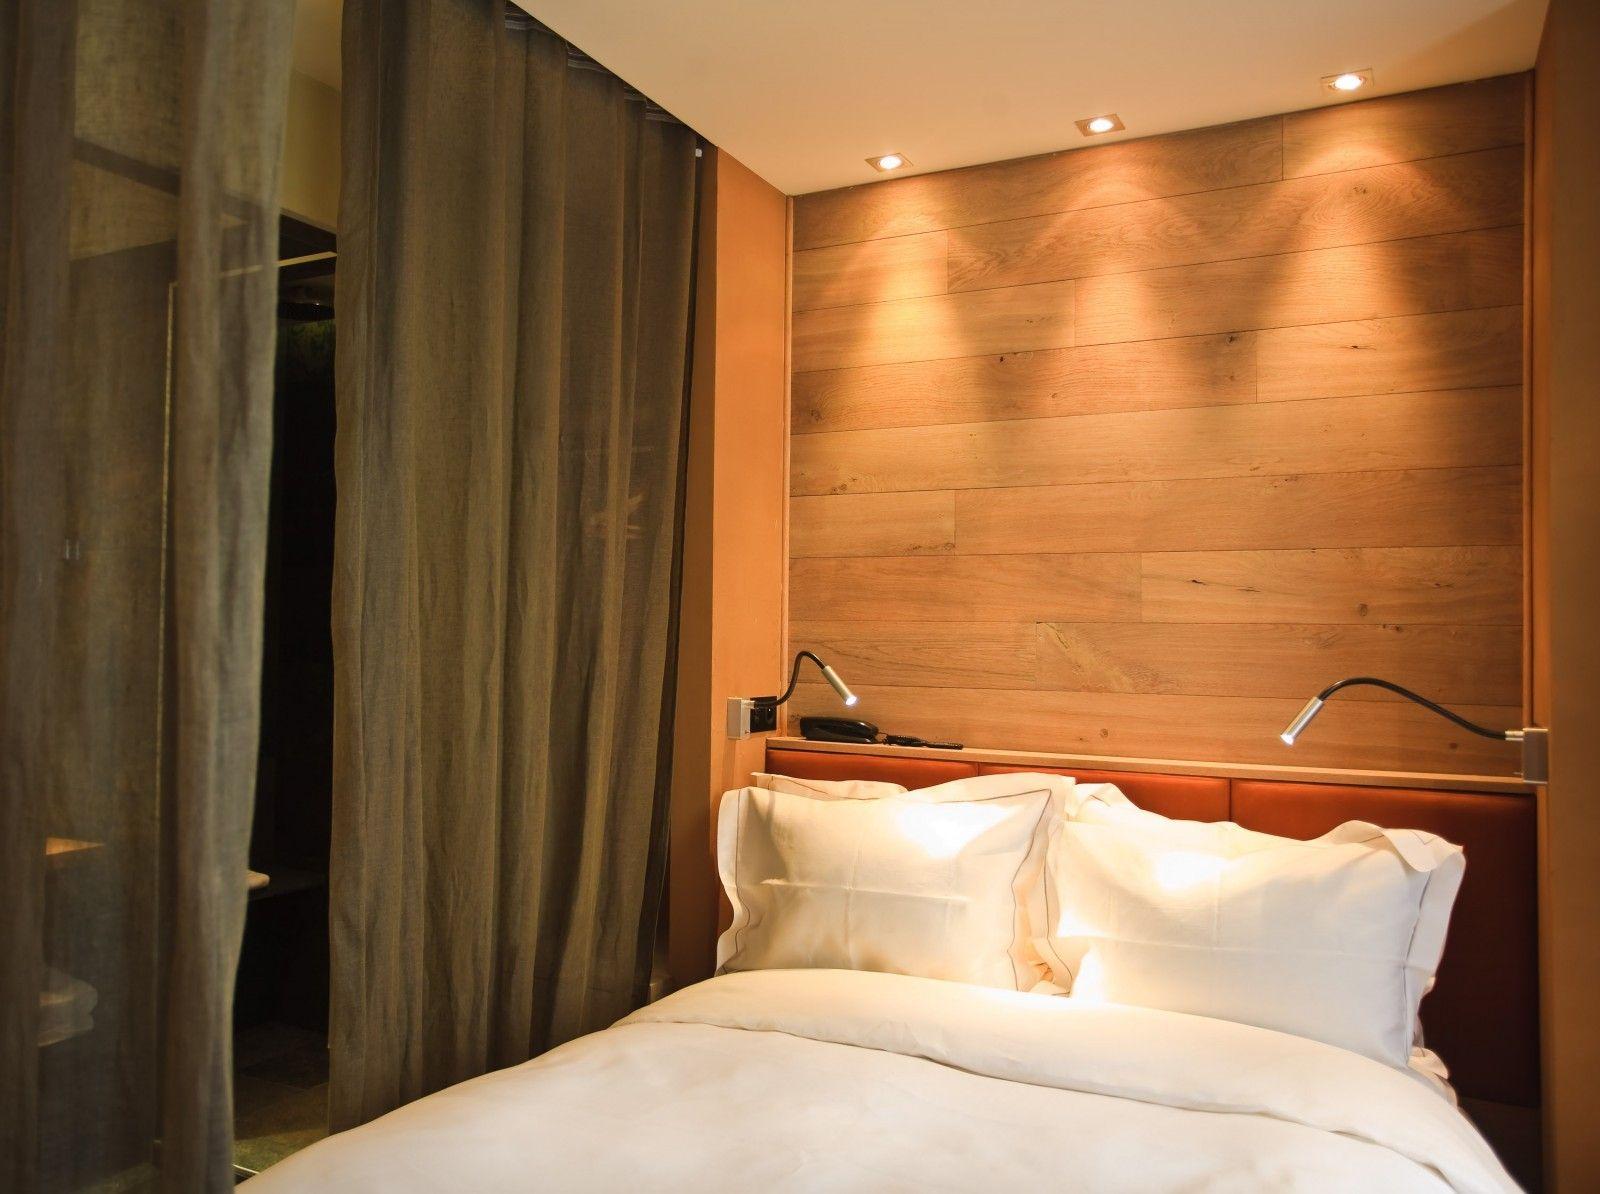 lampe de lecture chambre principale lampe de lecture. Black Bedroom Furniture Sets. Home Design Ideas